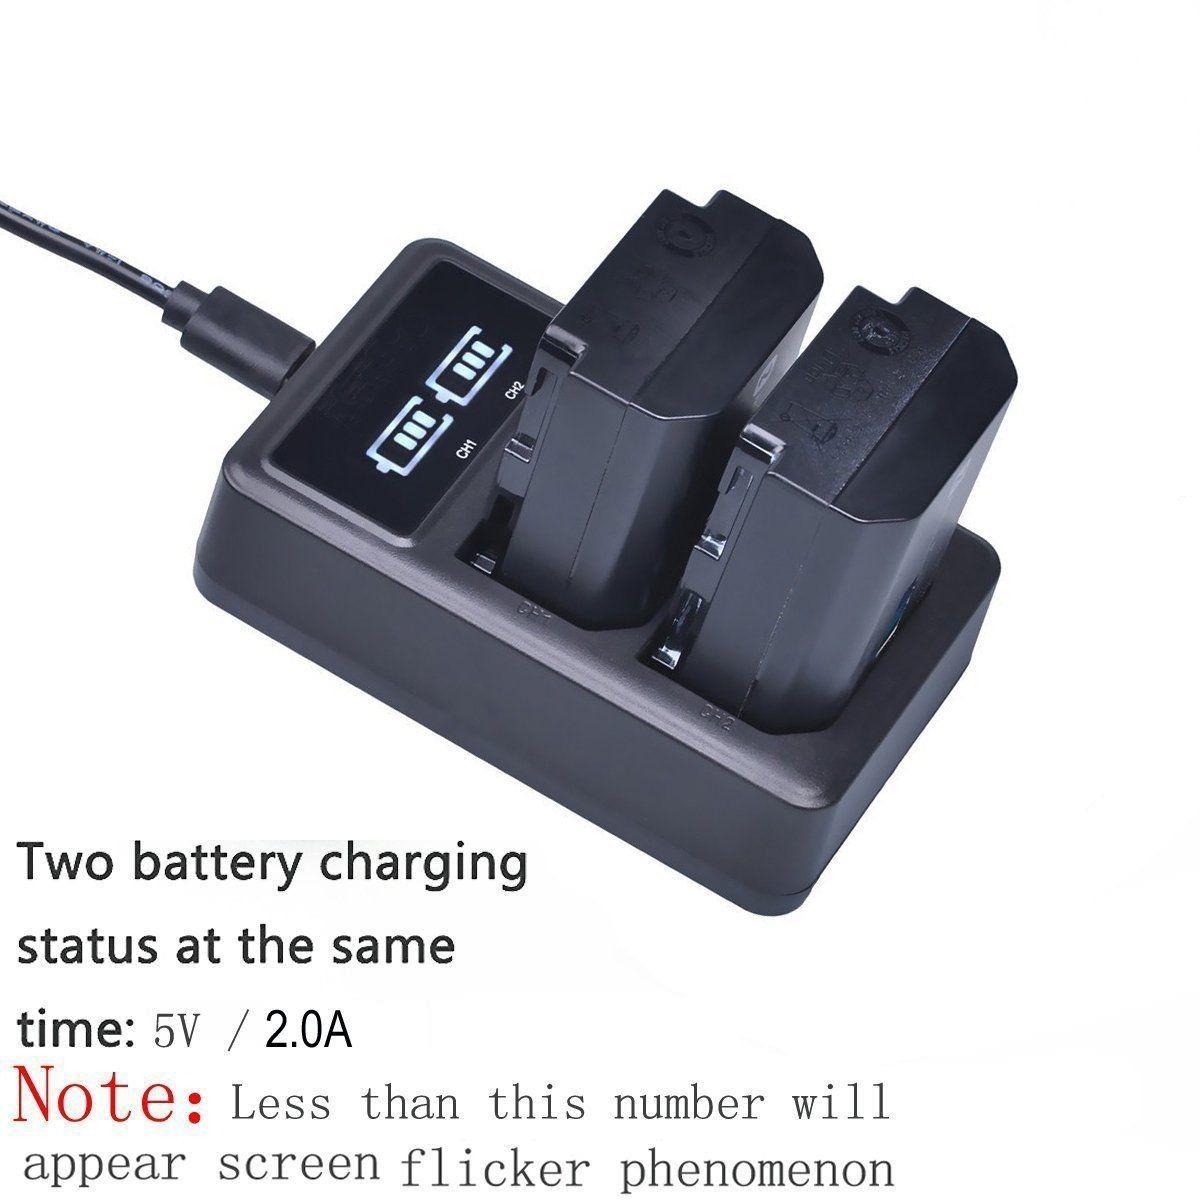 2 X Batera Np Fz100 Cargador Usb Para Sony Bc Qz1 Alfa 9 Battery Charger Cargando Zoom